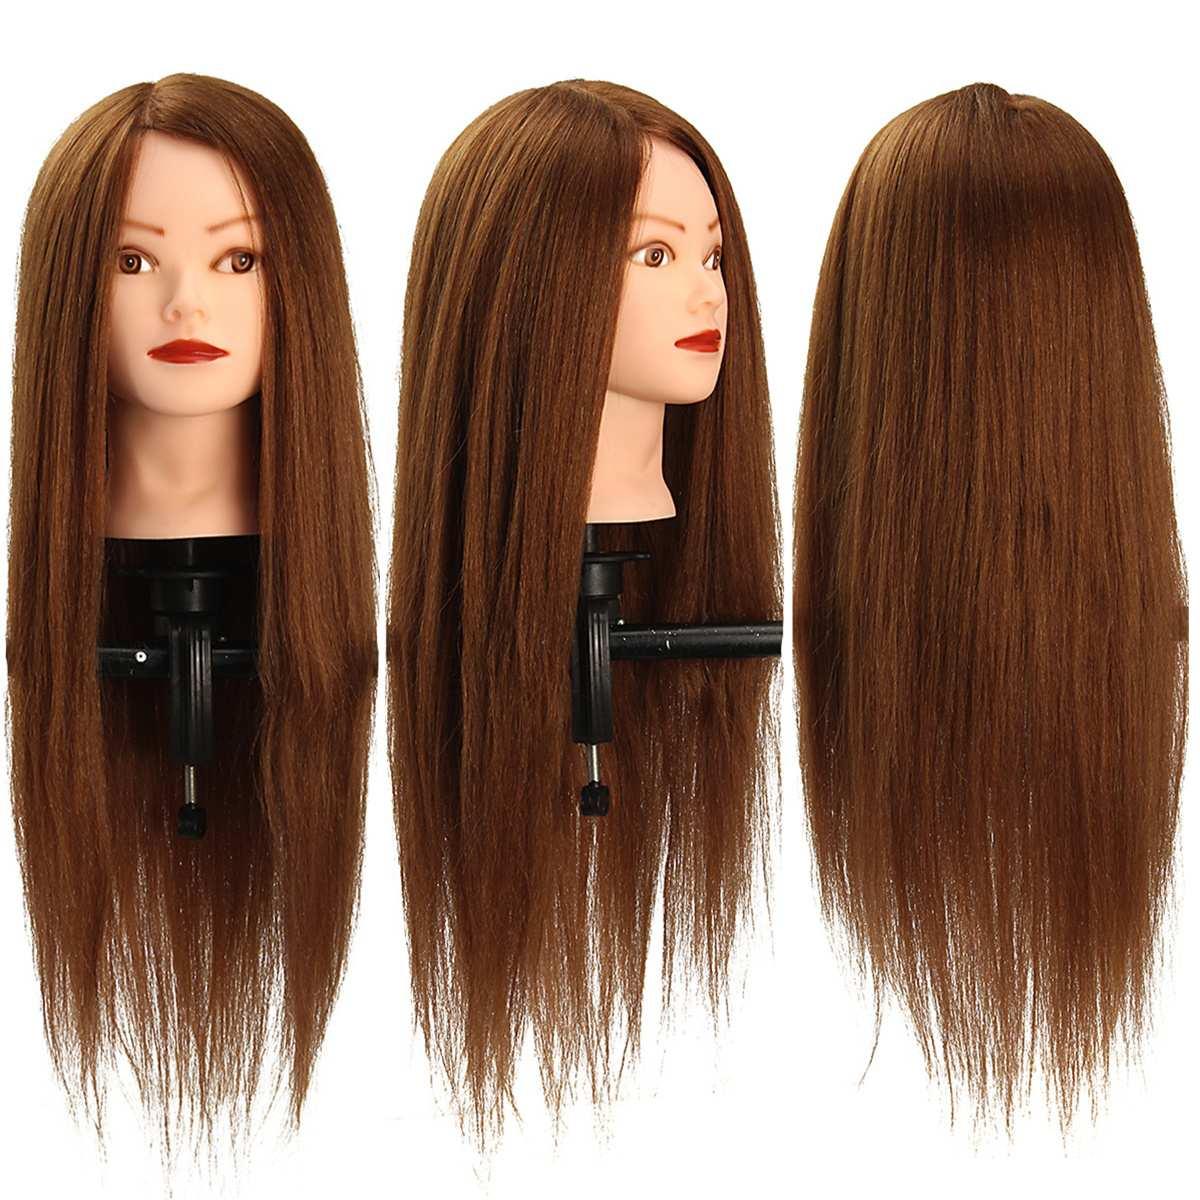 24 Inch 100% Real Human Hair Brown Straight Hair Training Head Hairdressing Practice Training Mannequin Hair Model Doll Head